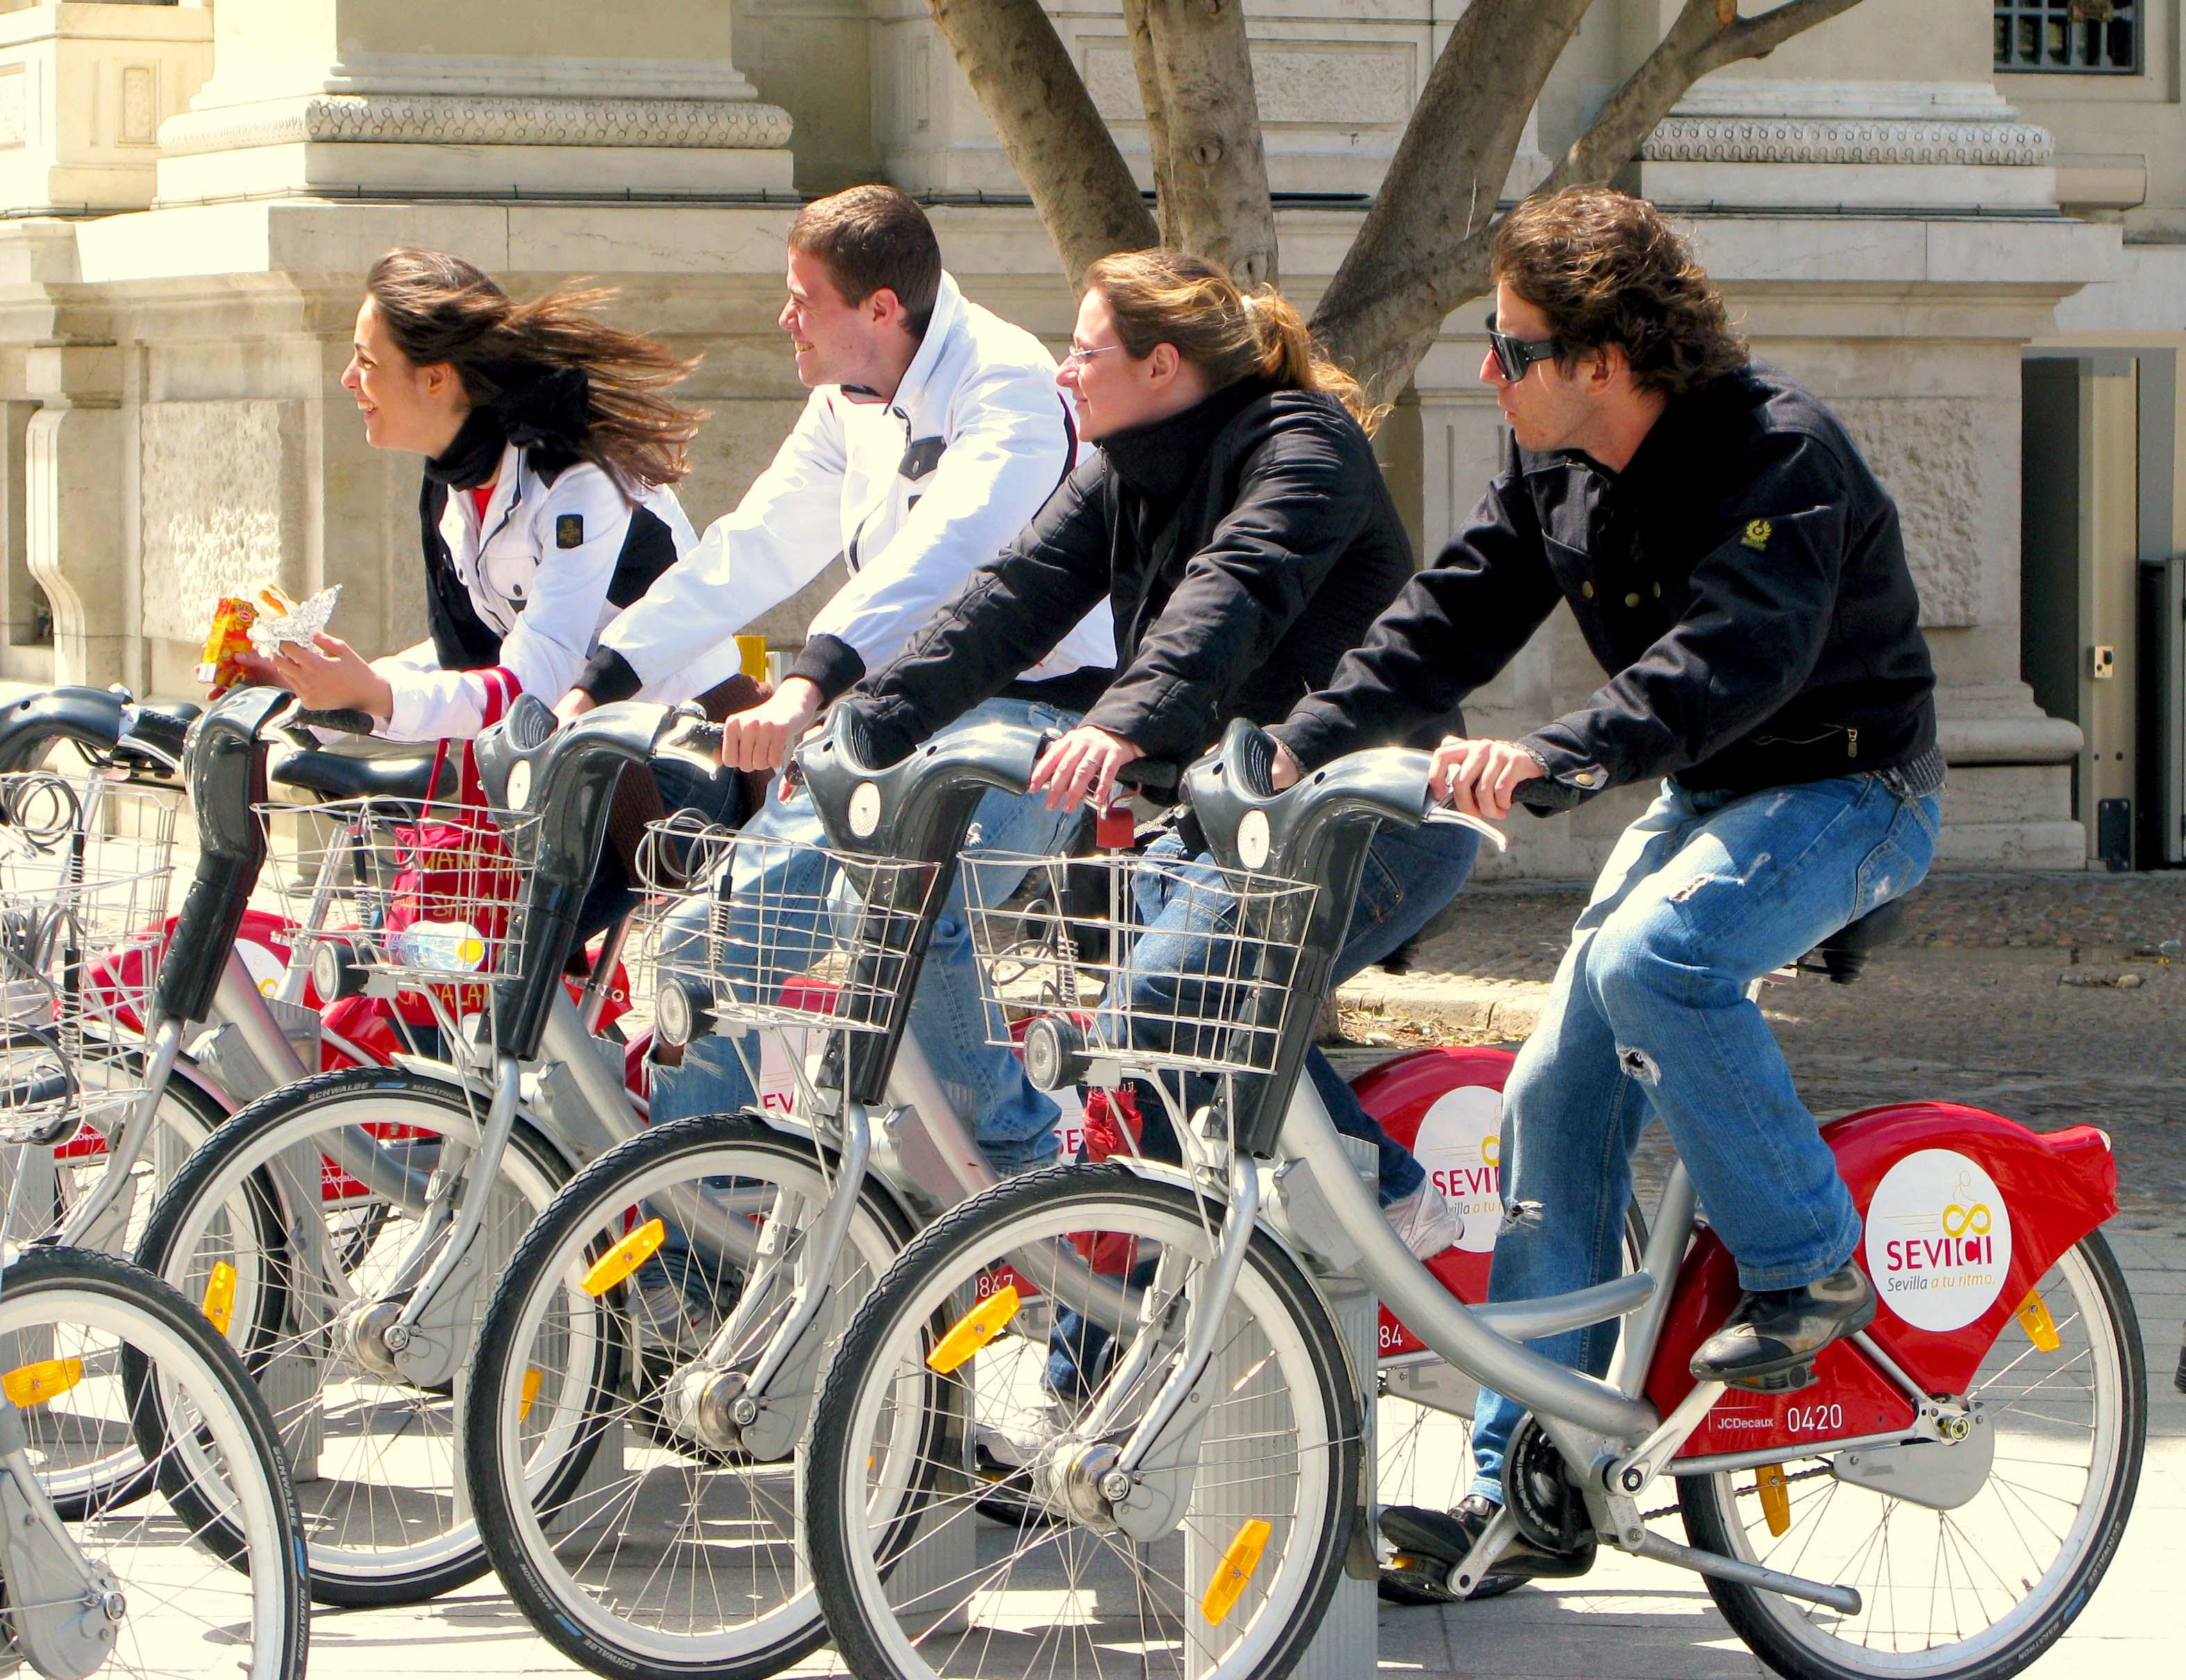 Bikes-Sevilla.jpg